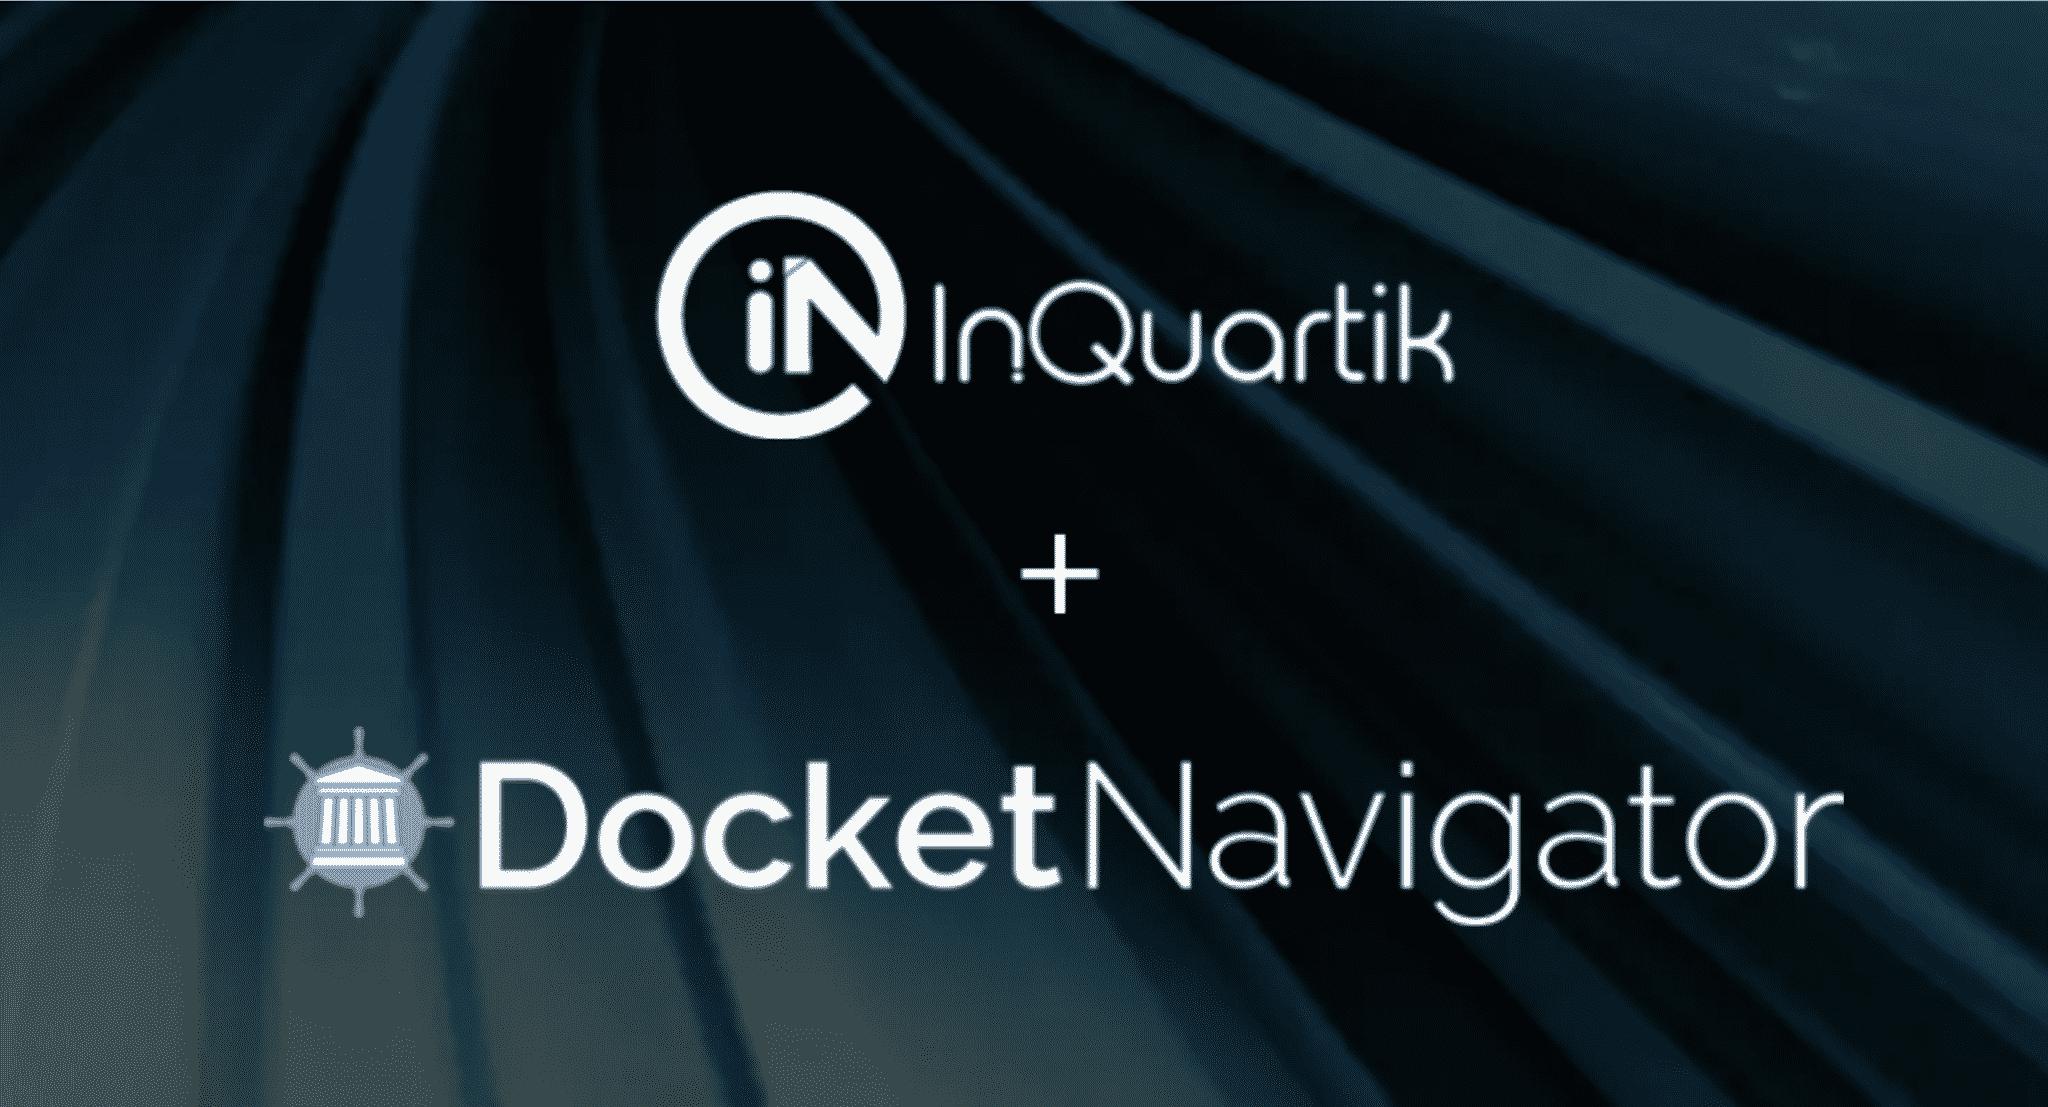 InQuartikの知財ソフトウェアとDocket Navigatorが提携し、プラットフォーム上で特許分析機能の提供を開始